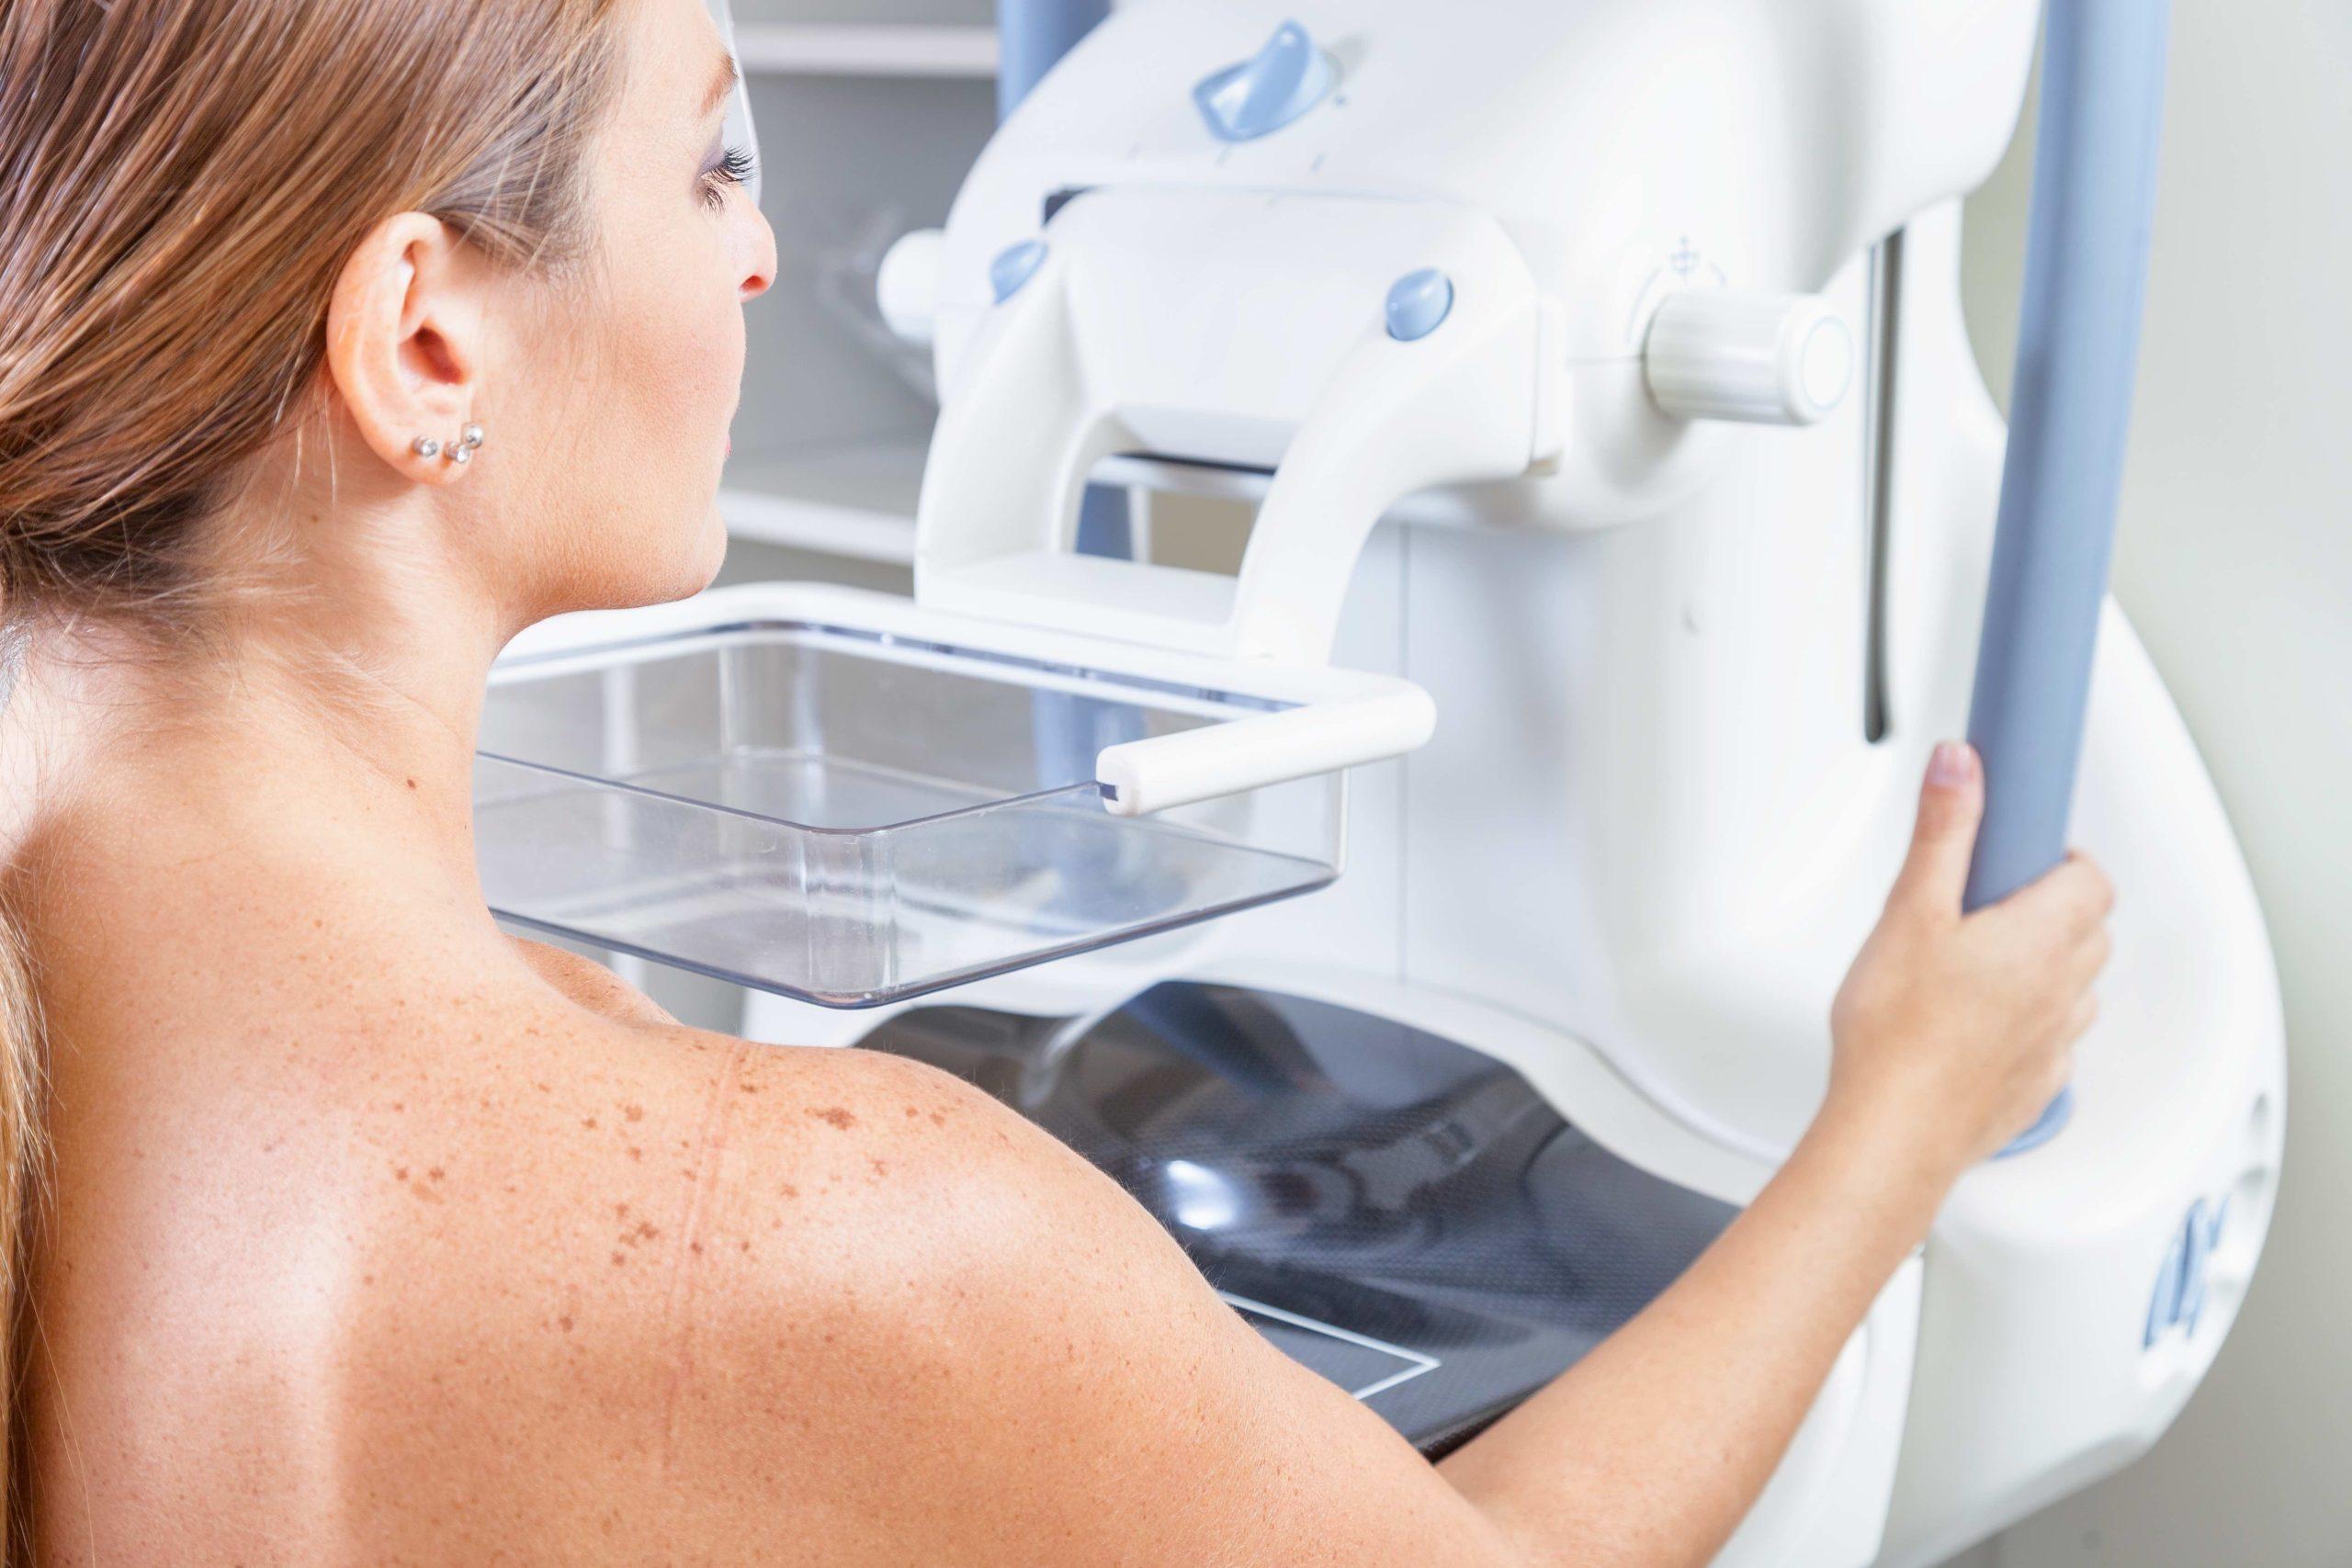 cos'è mammografia